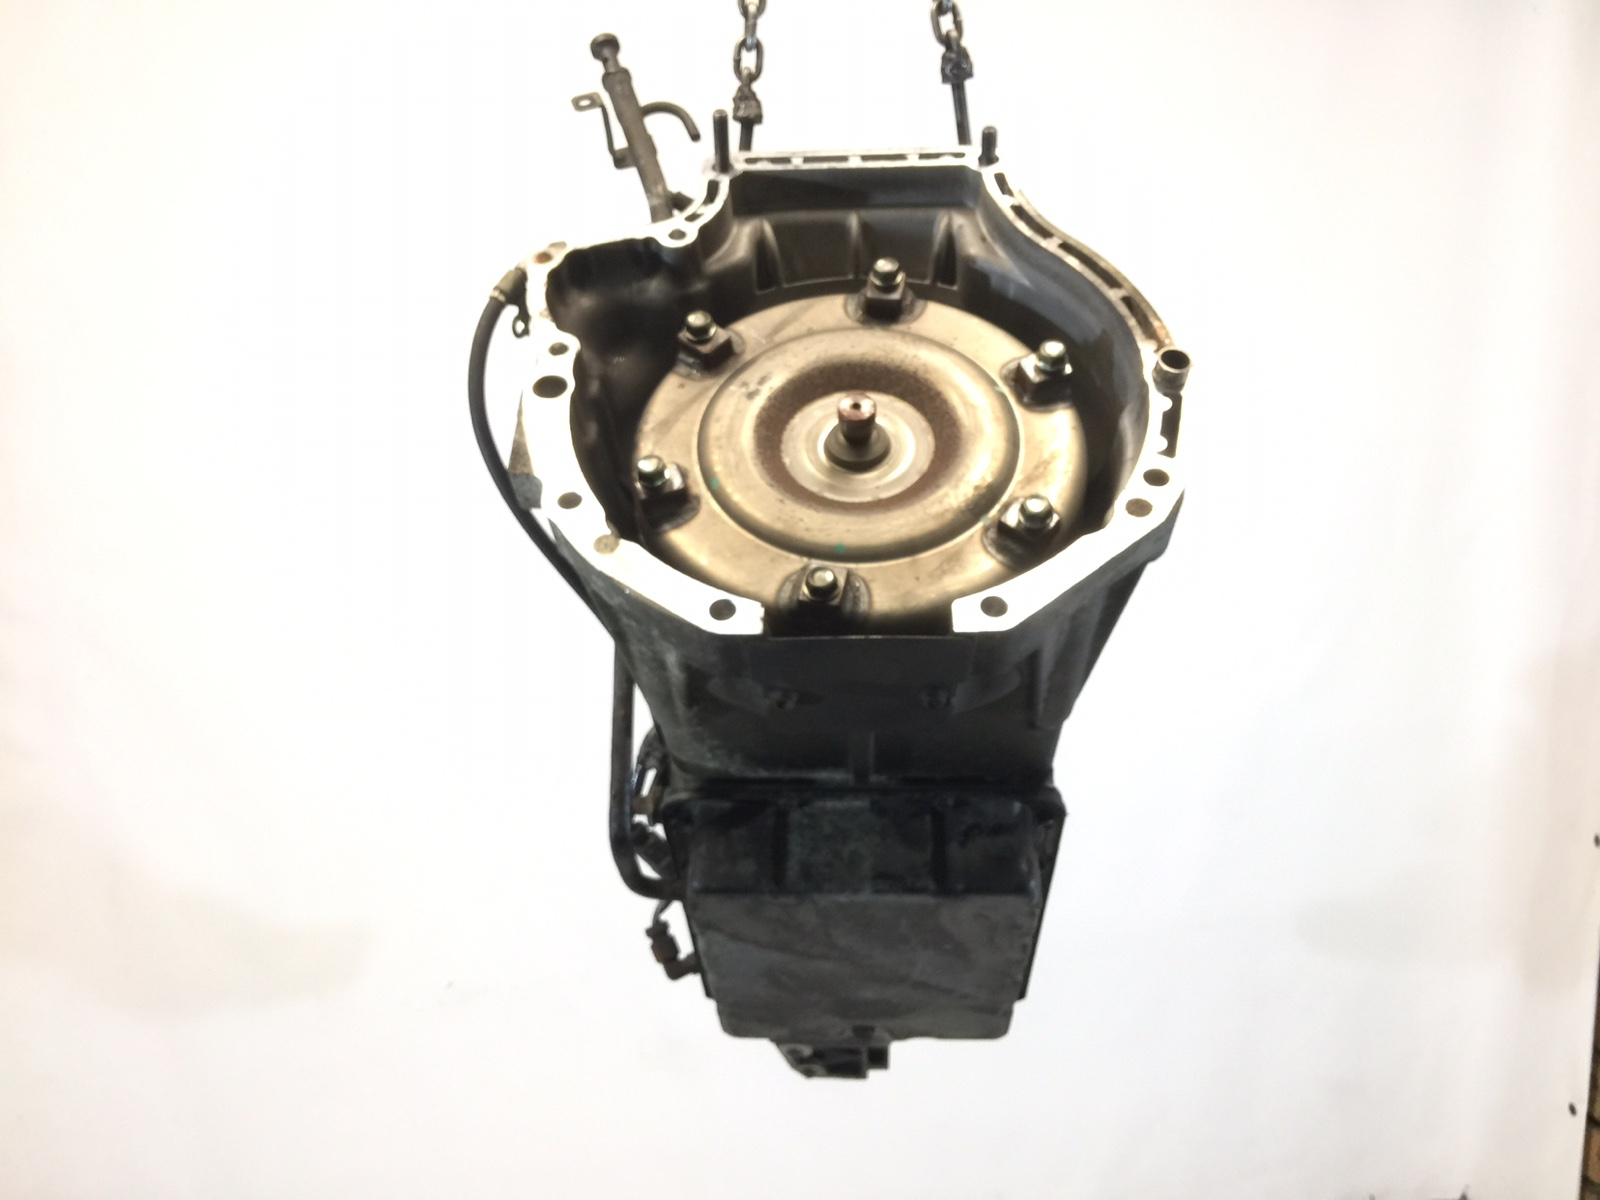 Кпп автоматическая (акпп) Mazda Mx5 1.8 I 2002 (б/у)